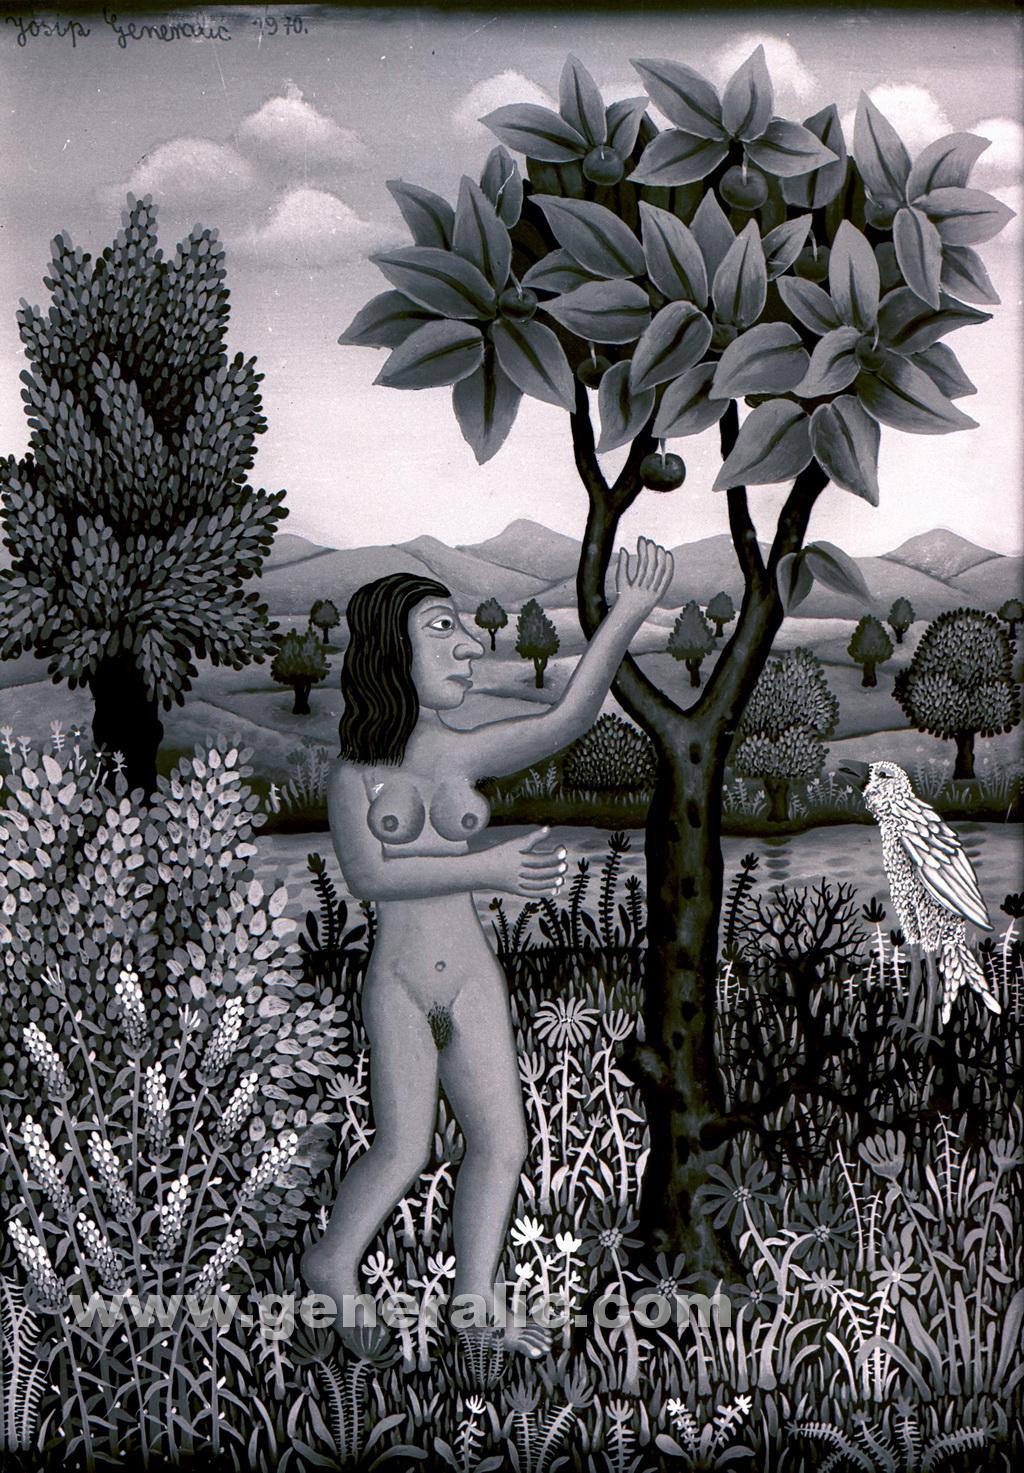 Josip Generalic, 1970, Eve, oil on canvas